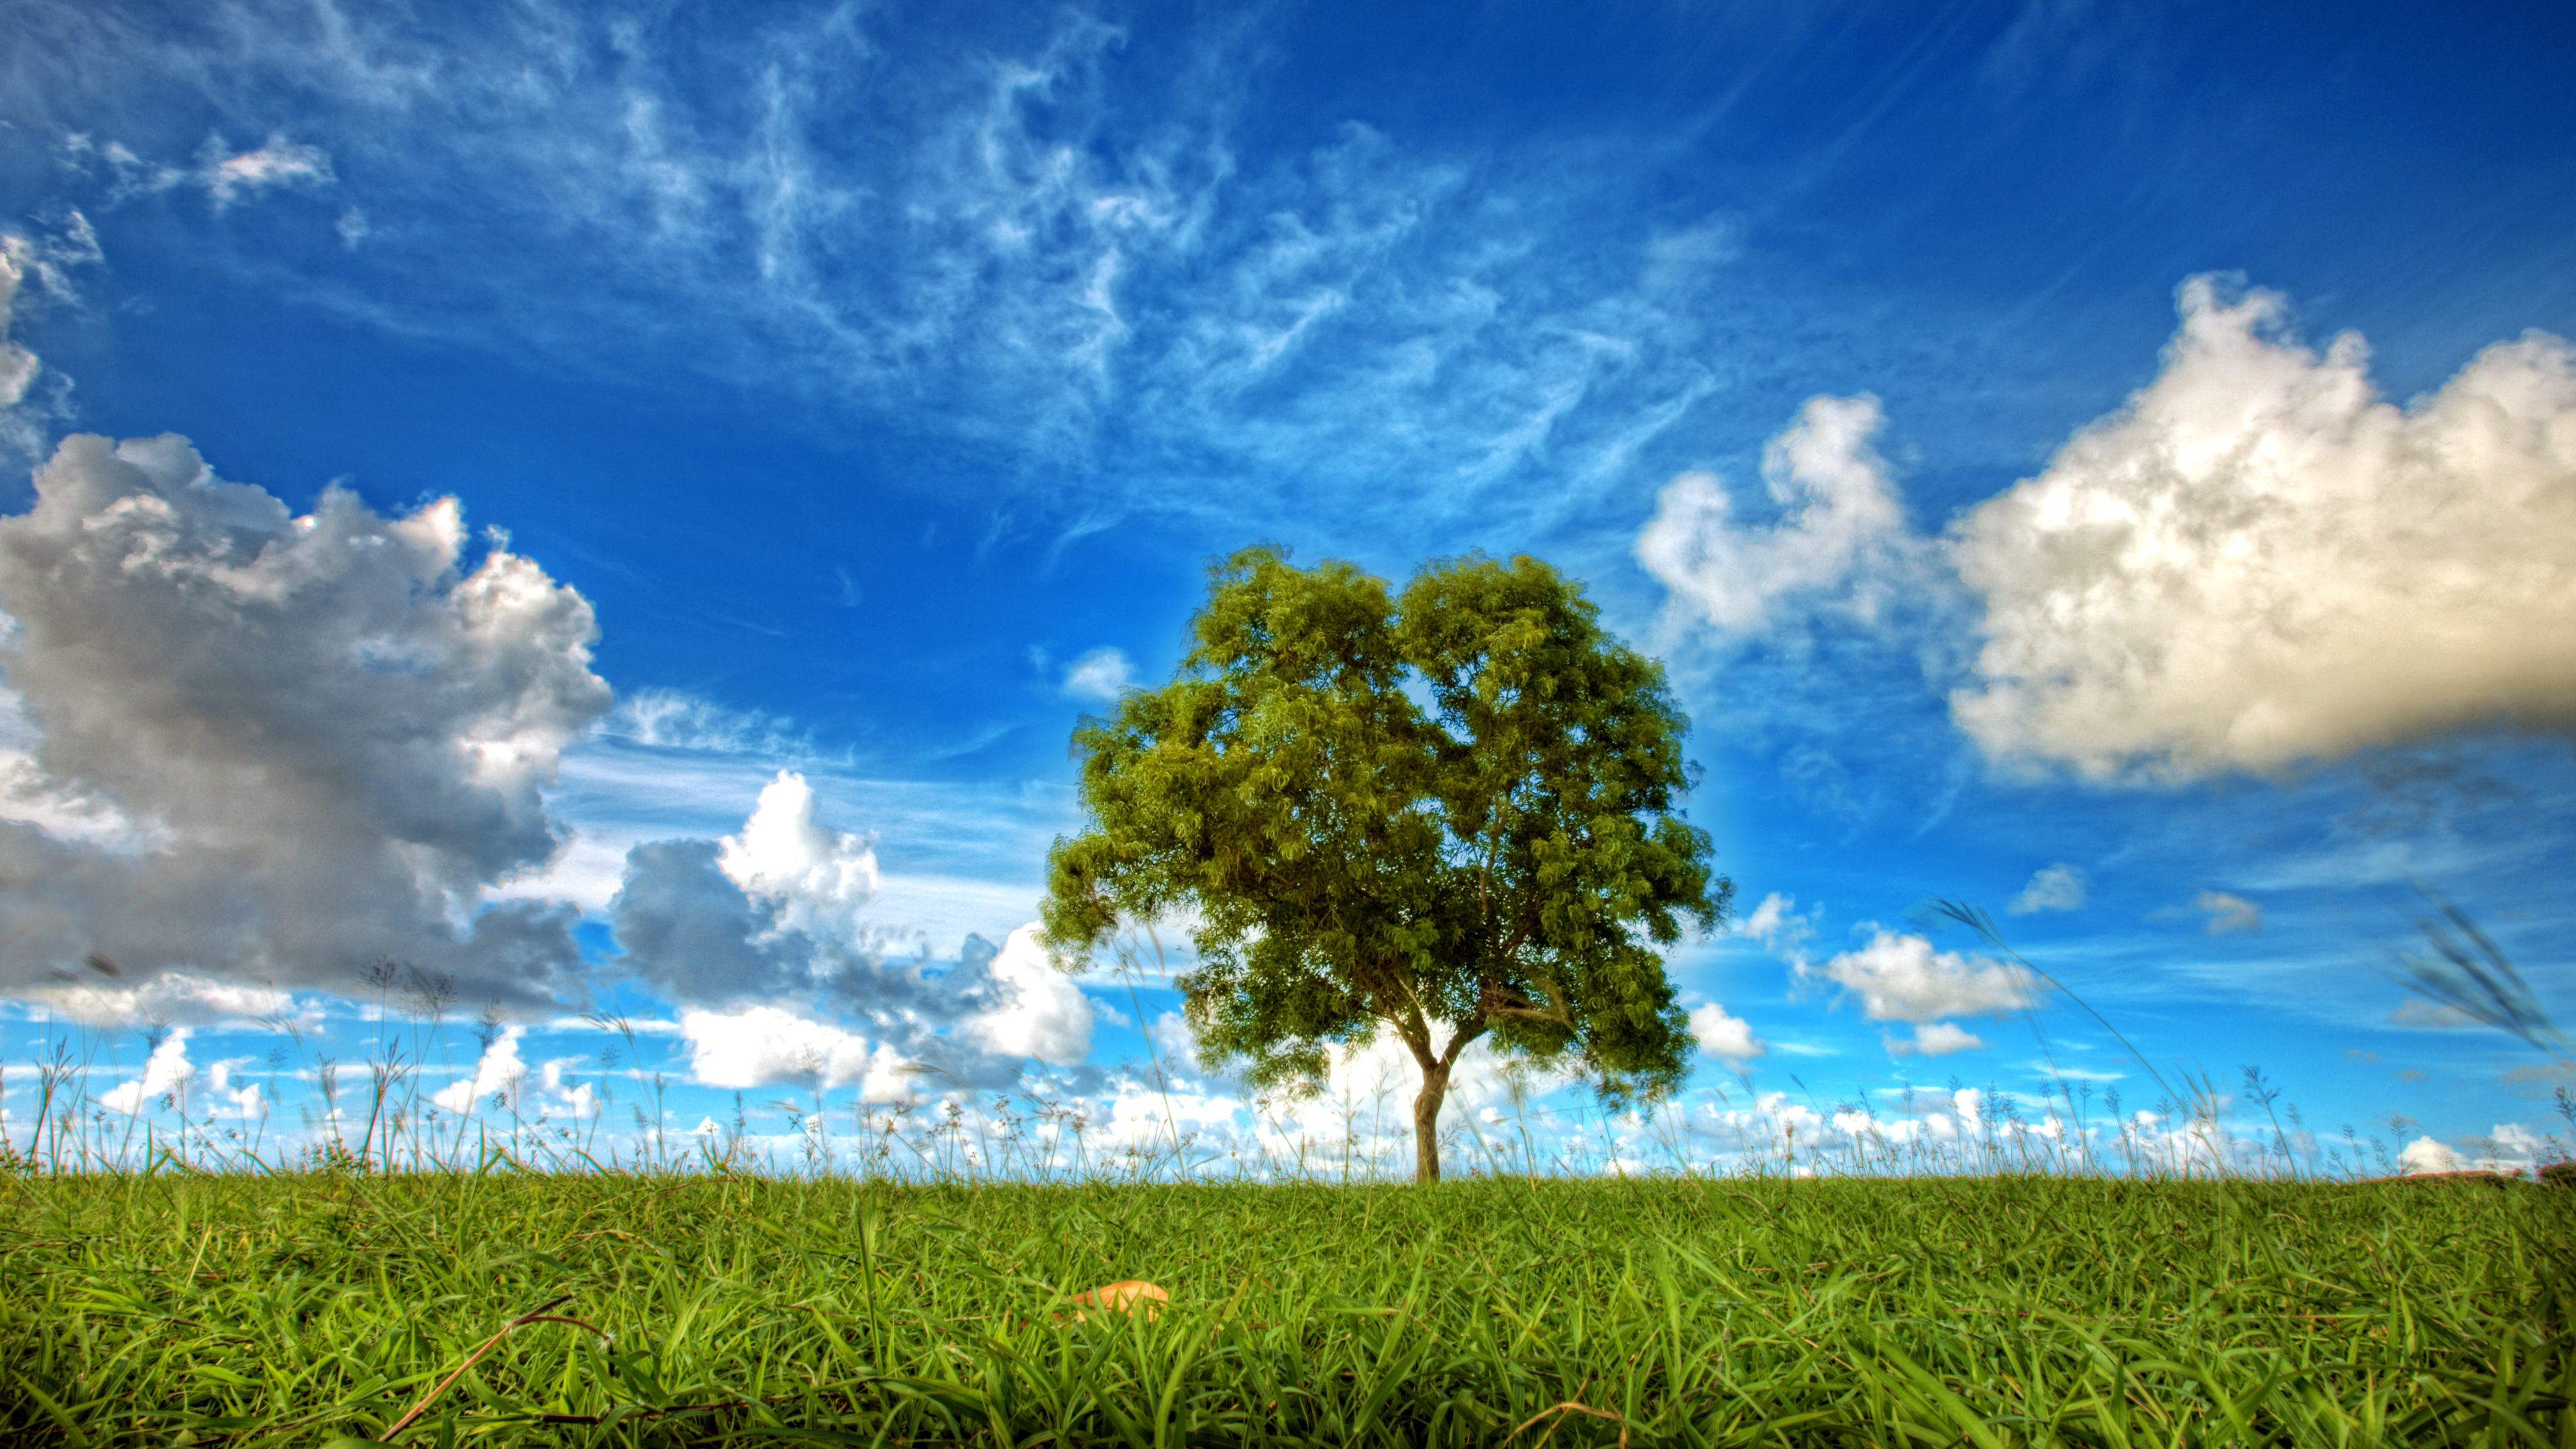 поле, трава, дерево